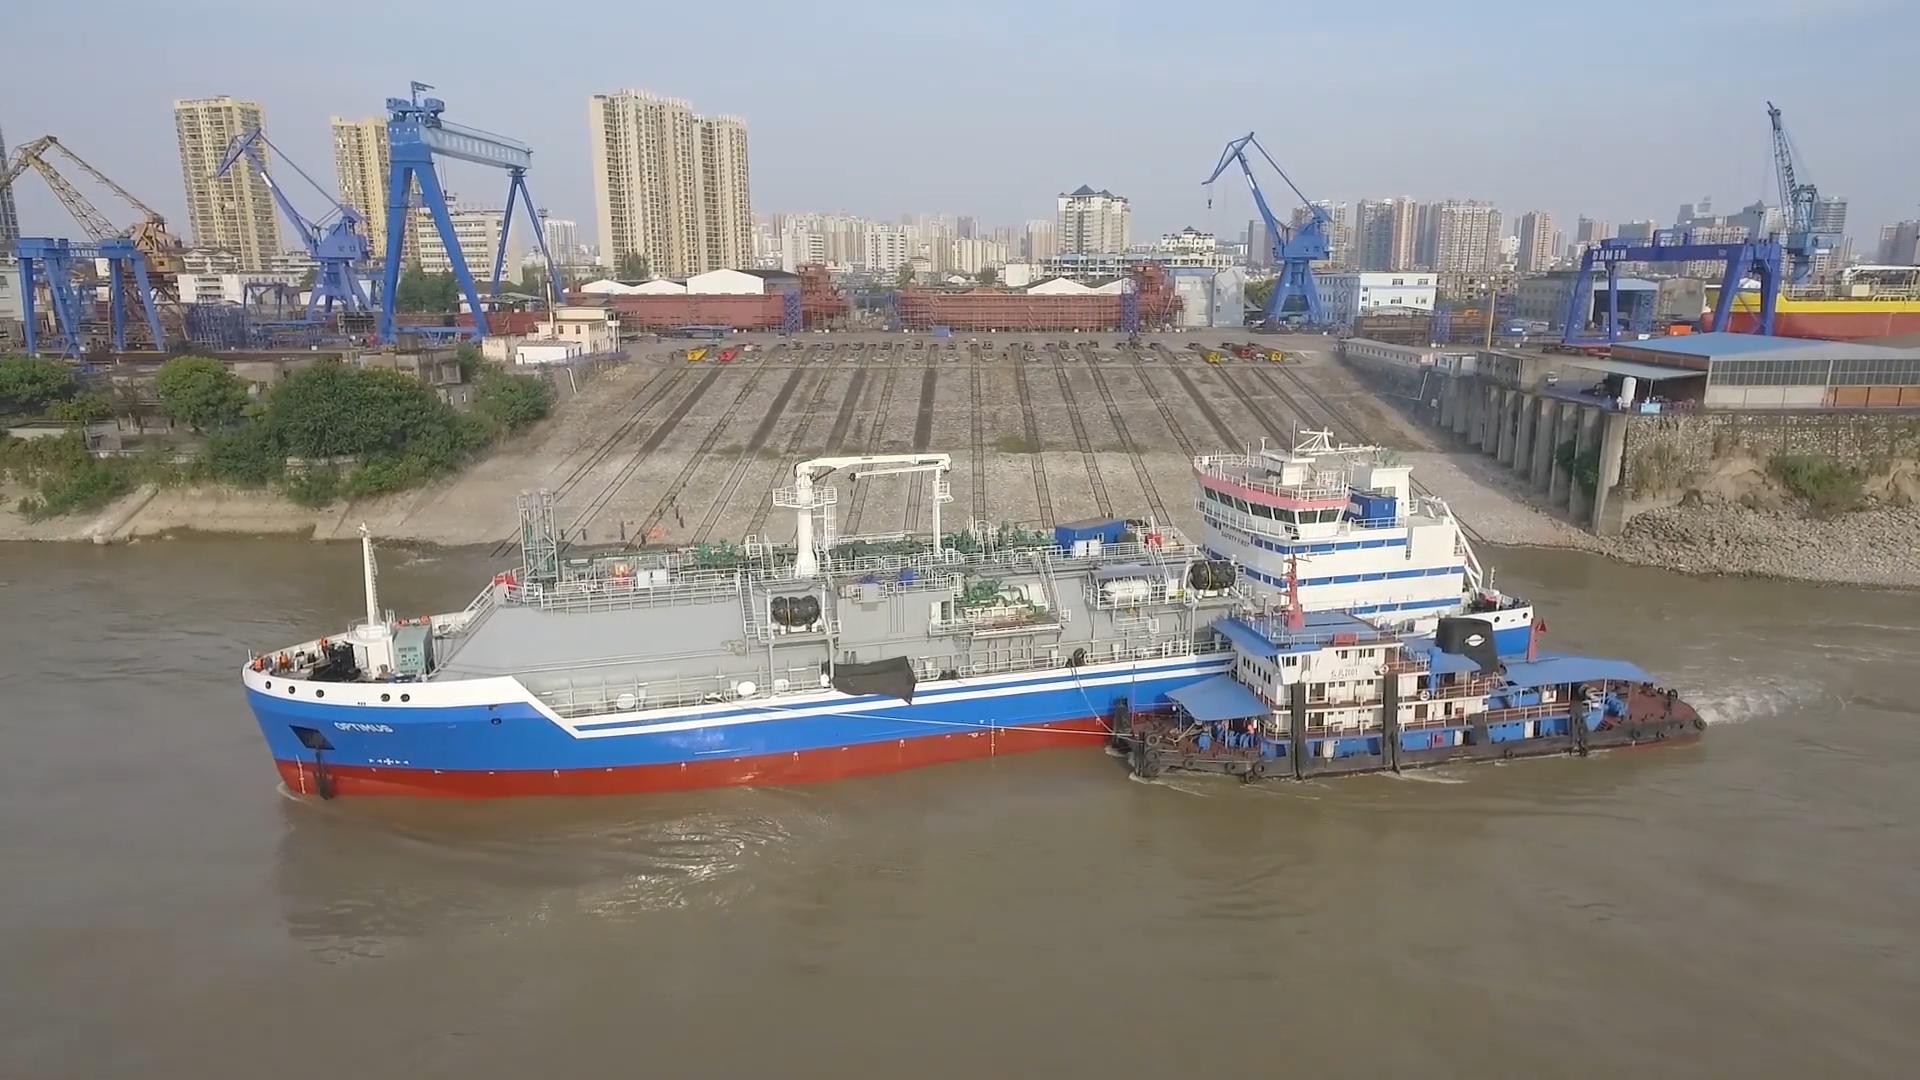 Elenger's LNG bunkering vessel nearing completion